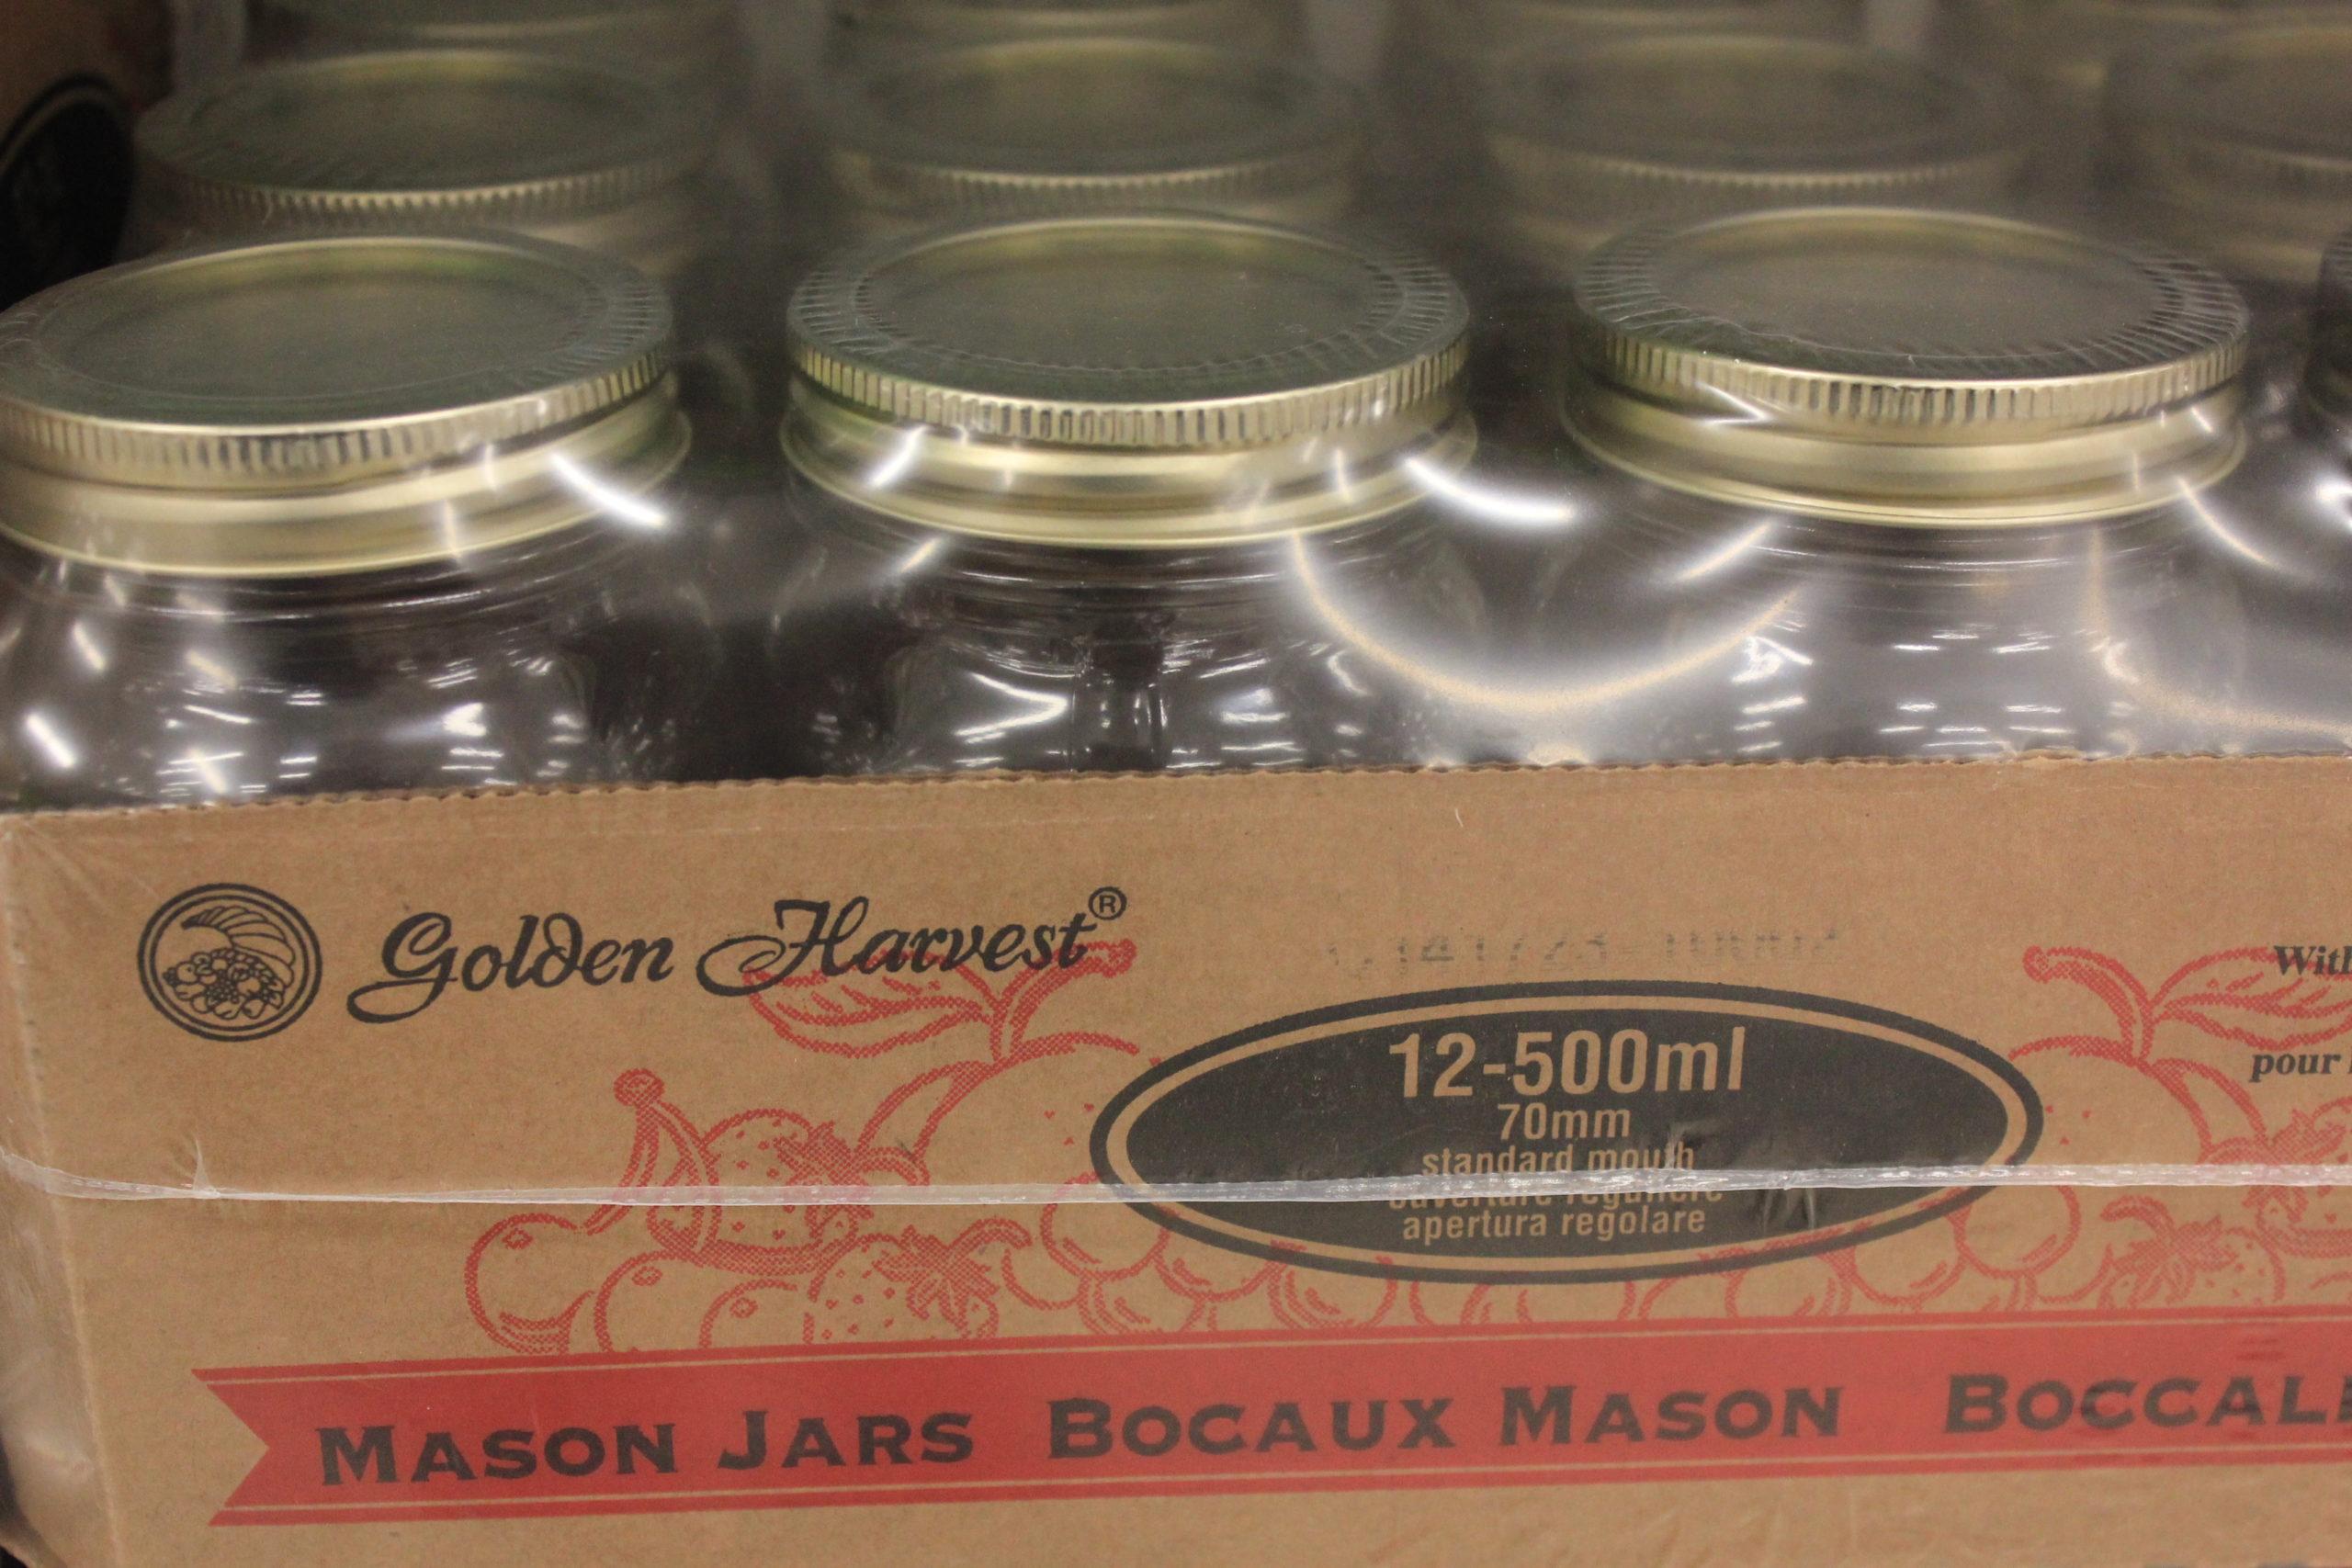 Golden Harvest Mason Jars